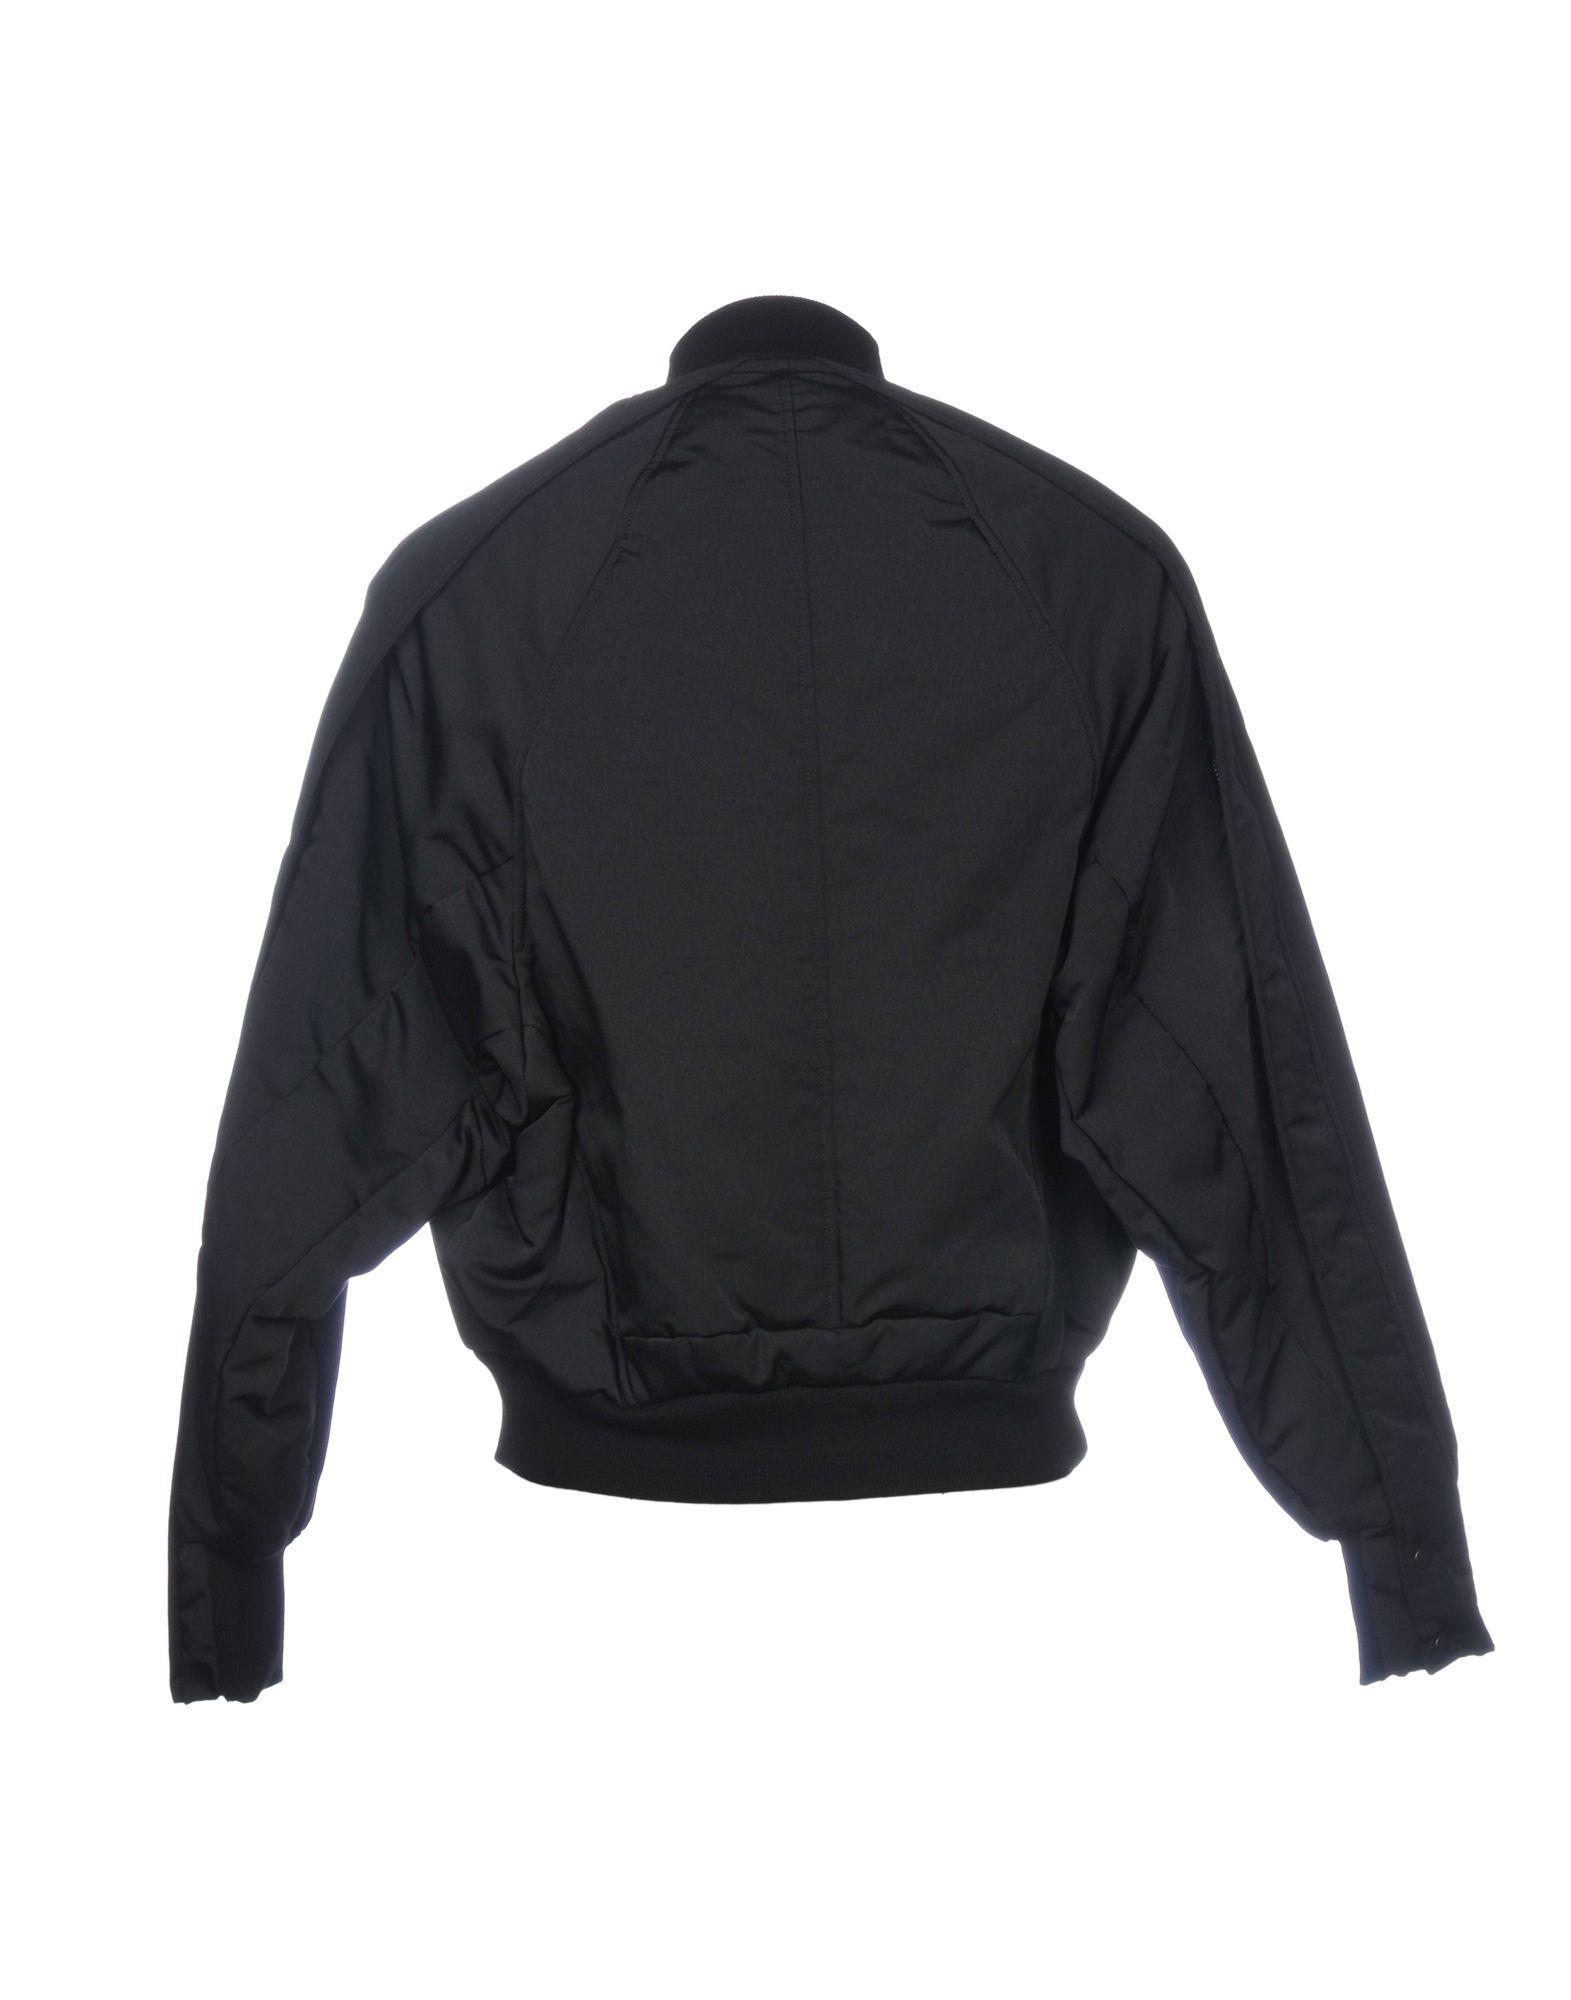 _JULIUS Synthetic Jacket in Black for Men